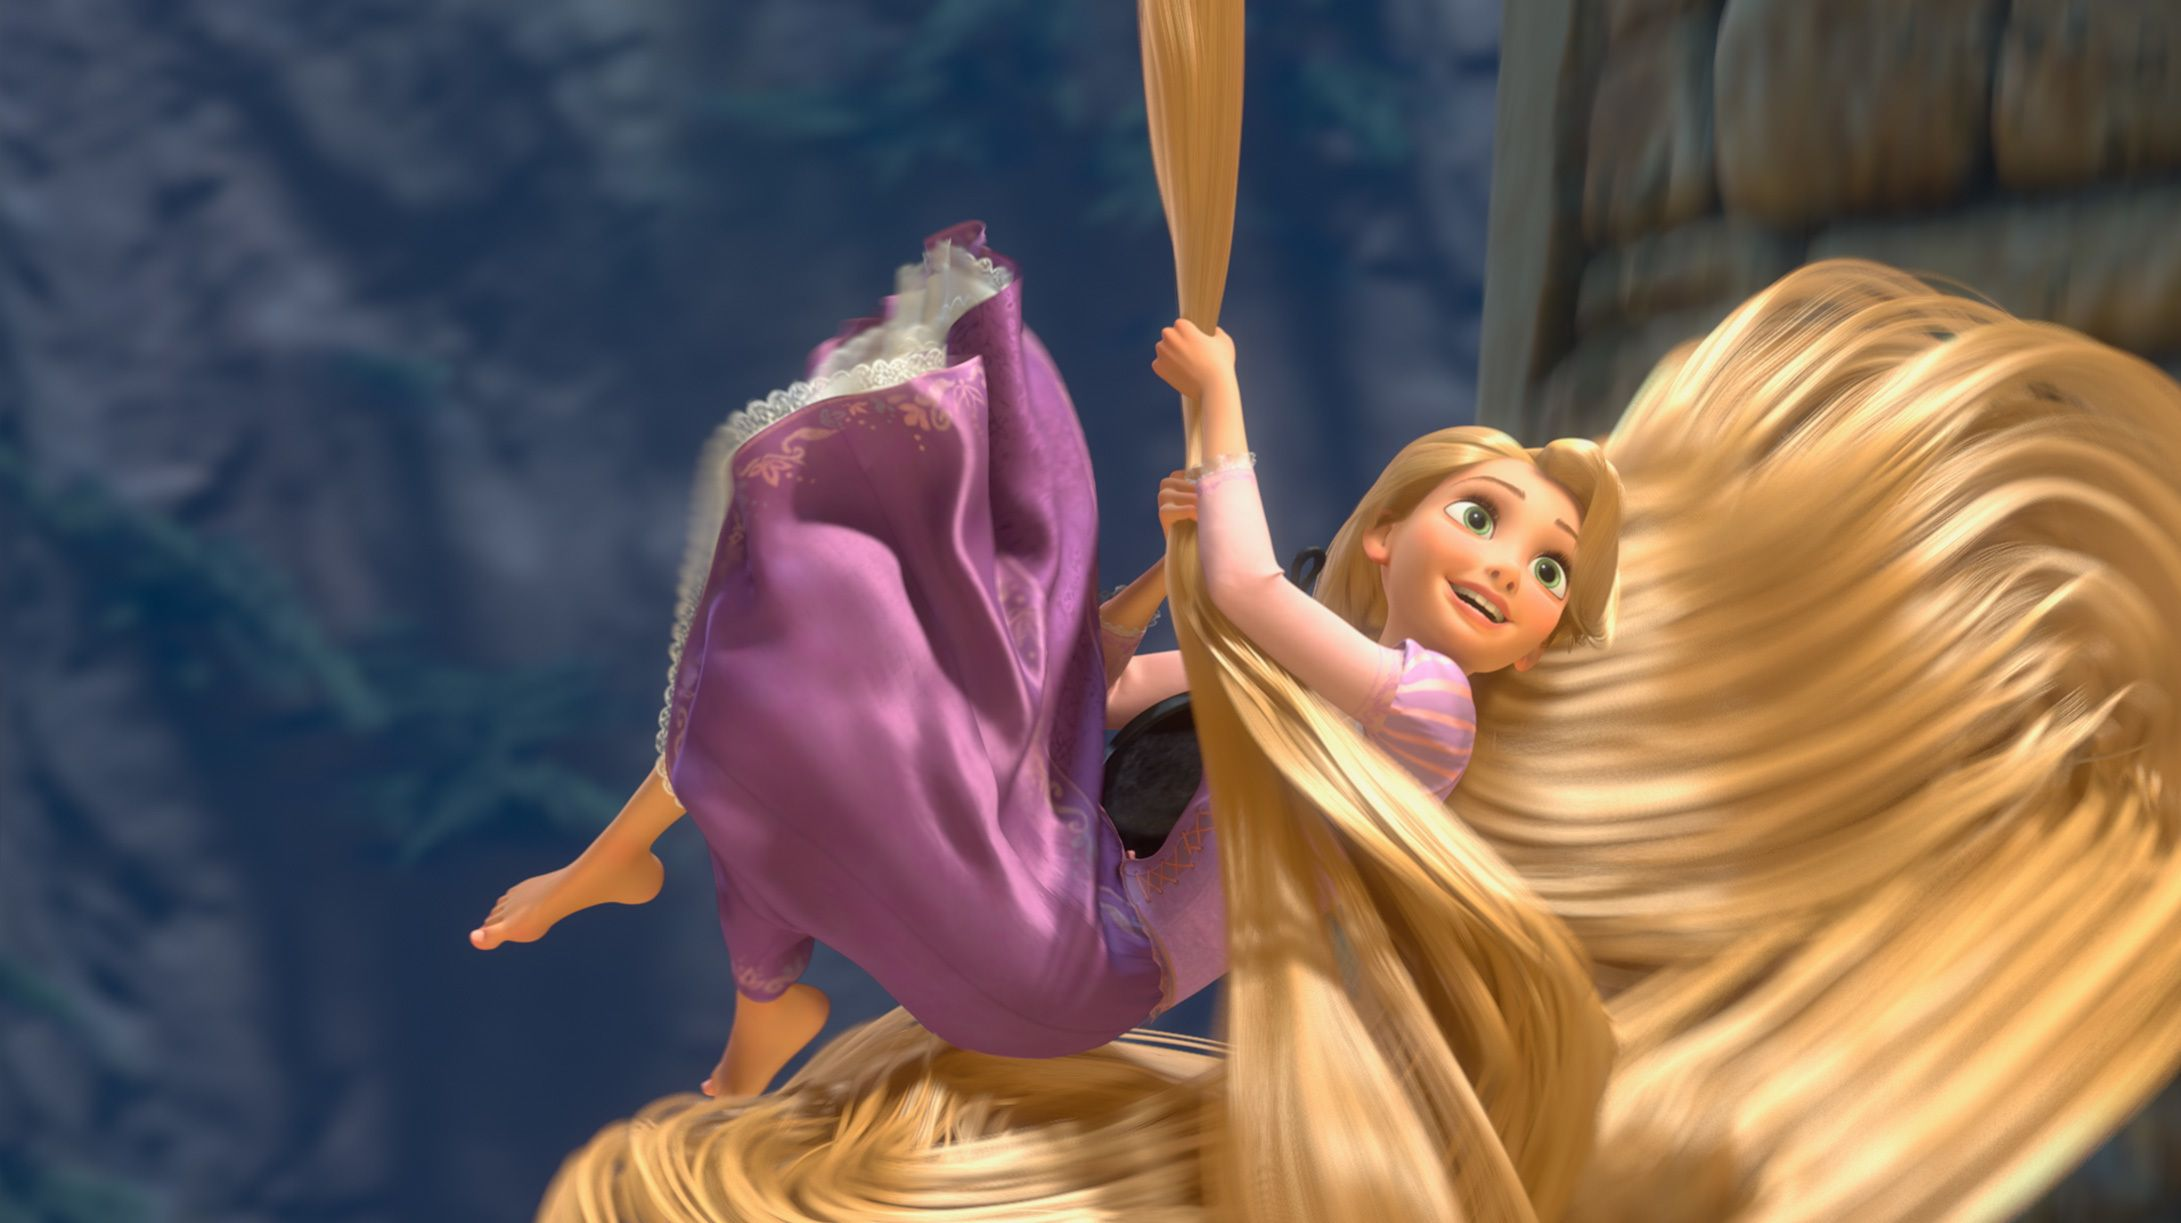 Rapunzel Photo Gallery Disney Princess Images Disney Princess List Official Disney Princesses